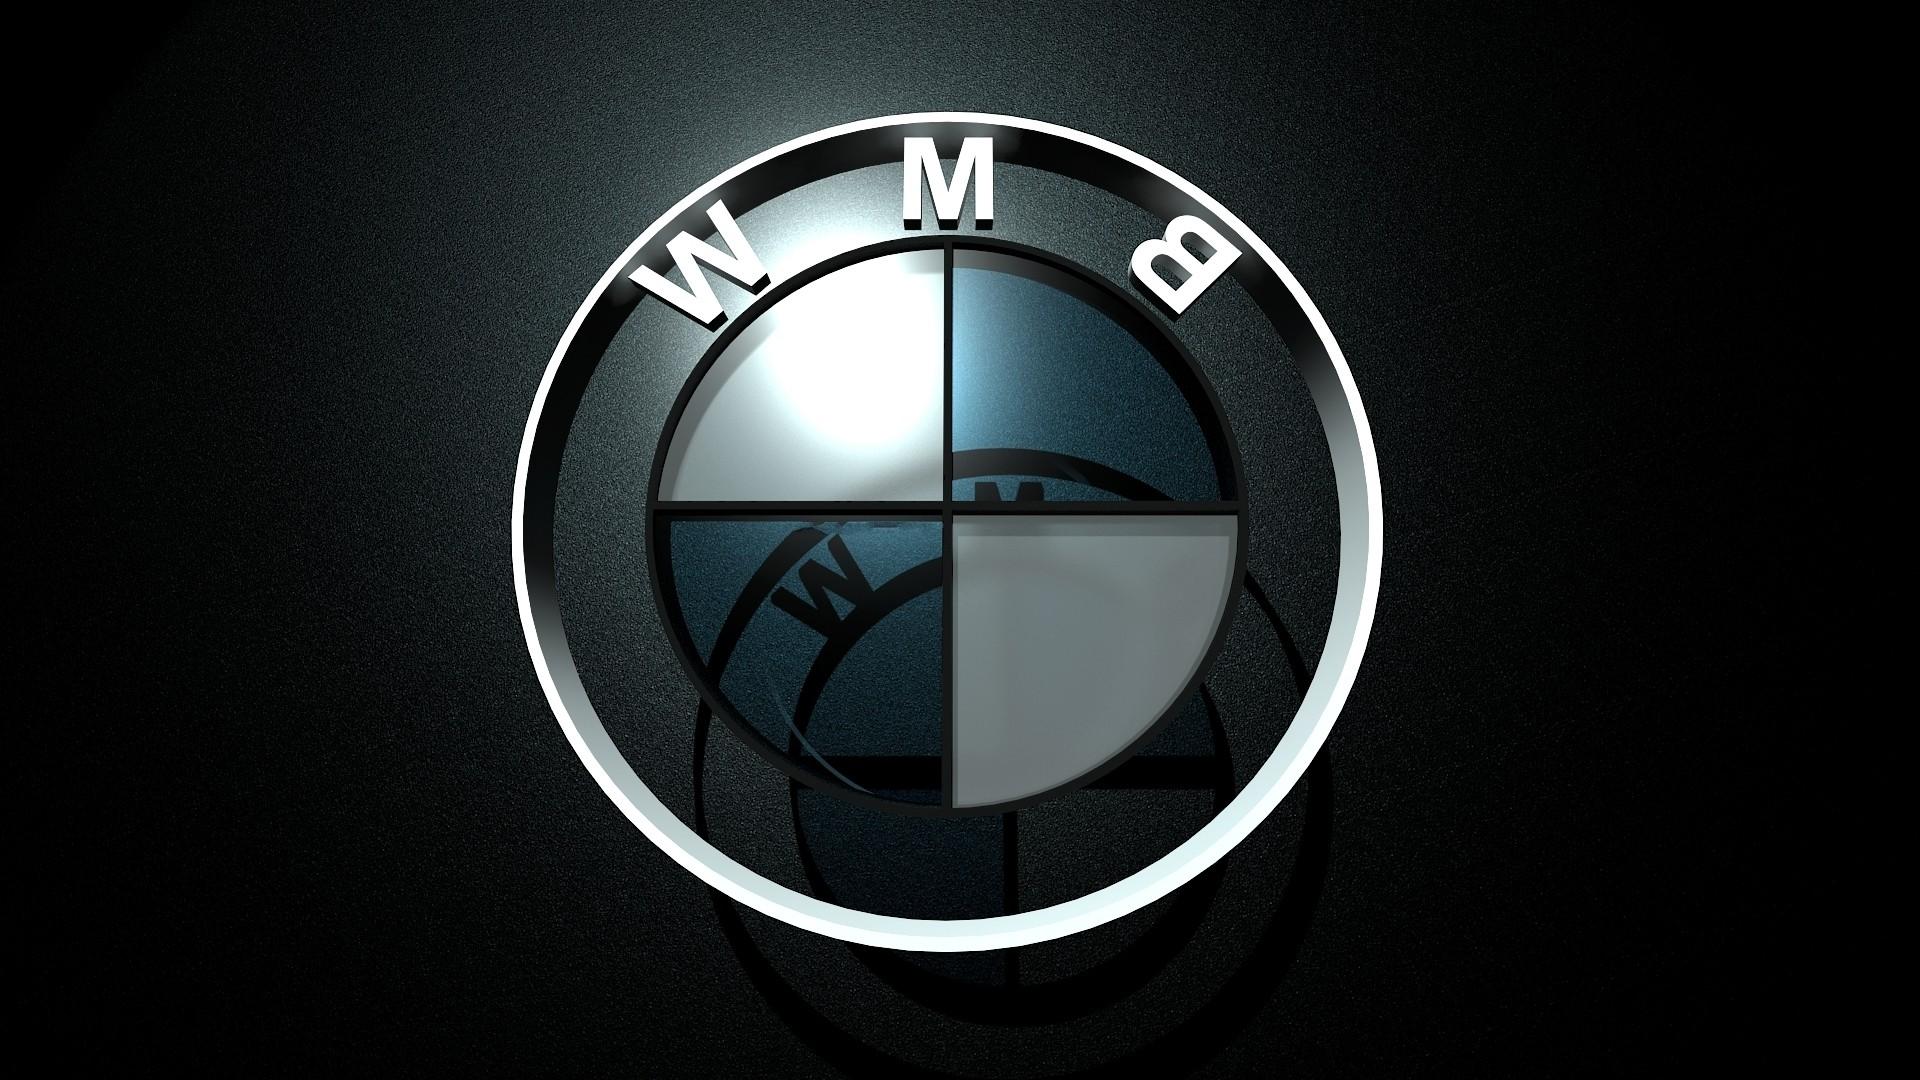 Bmw Logo Wallpaper 1920x1080 83 Images